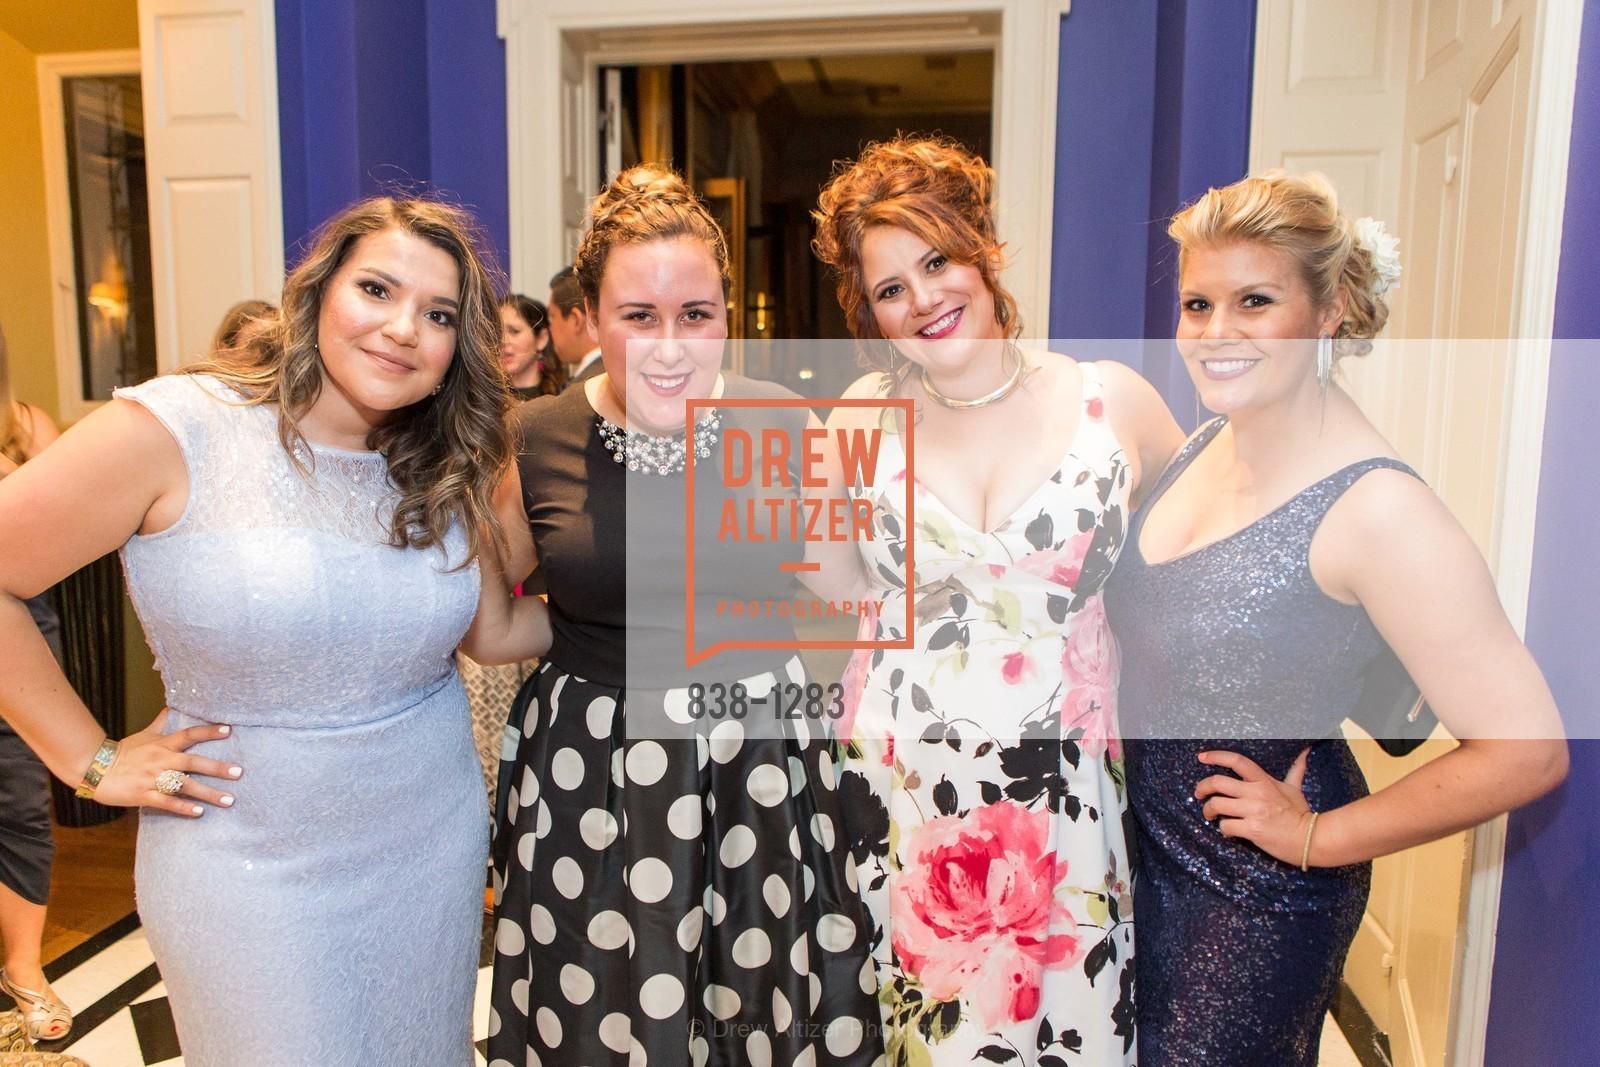 Andrea Valencia, Rachel Kruknick, Xanadu Bruggers, Laura Davis, Photo #838-1283